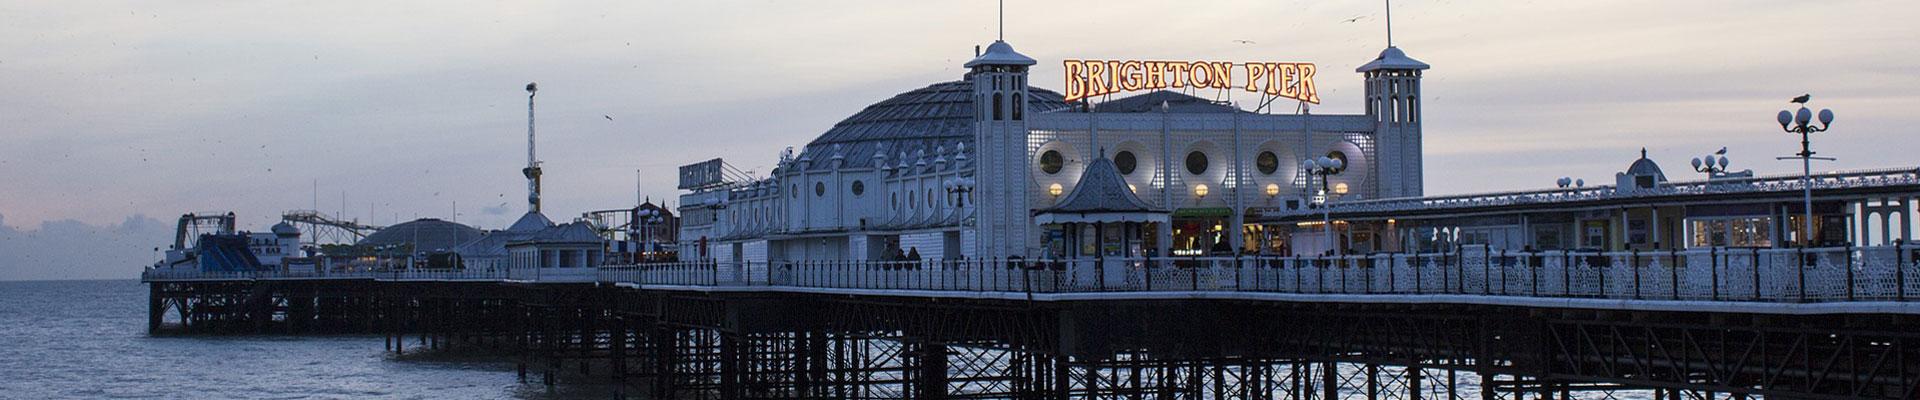 Oxford International Brighton